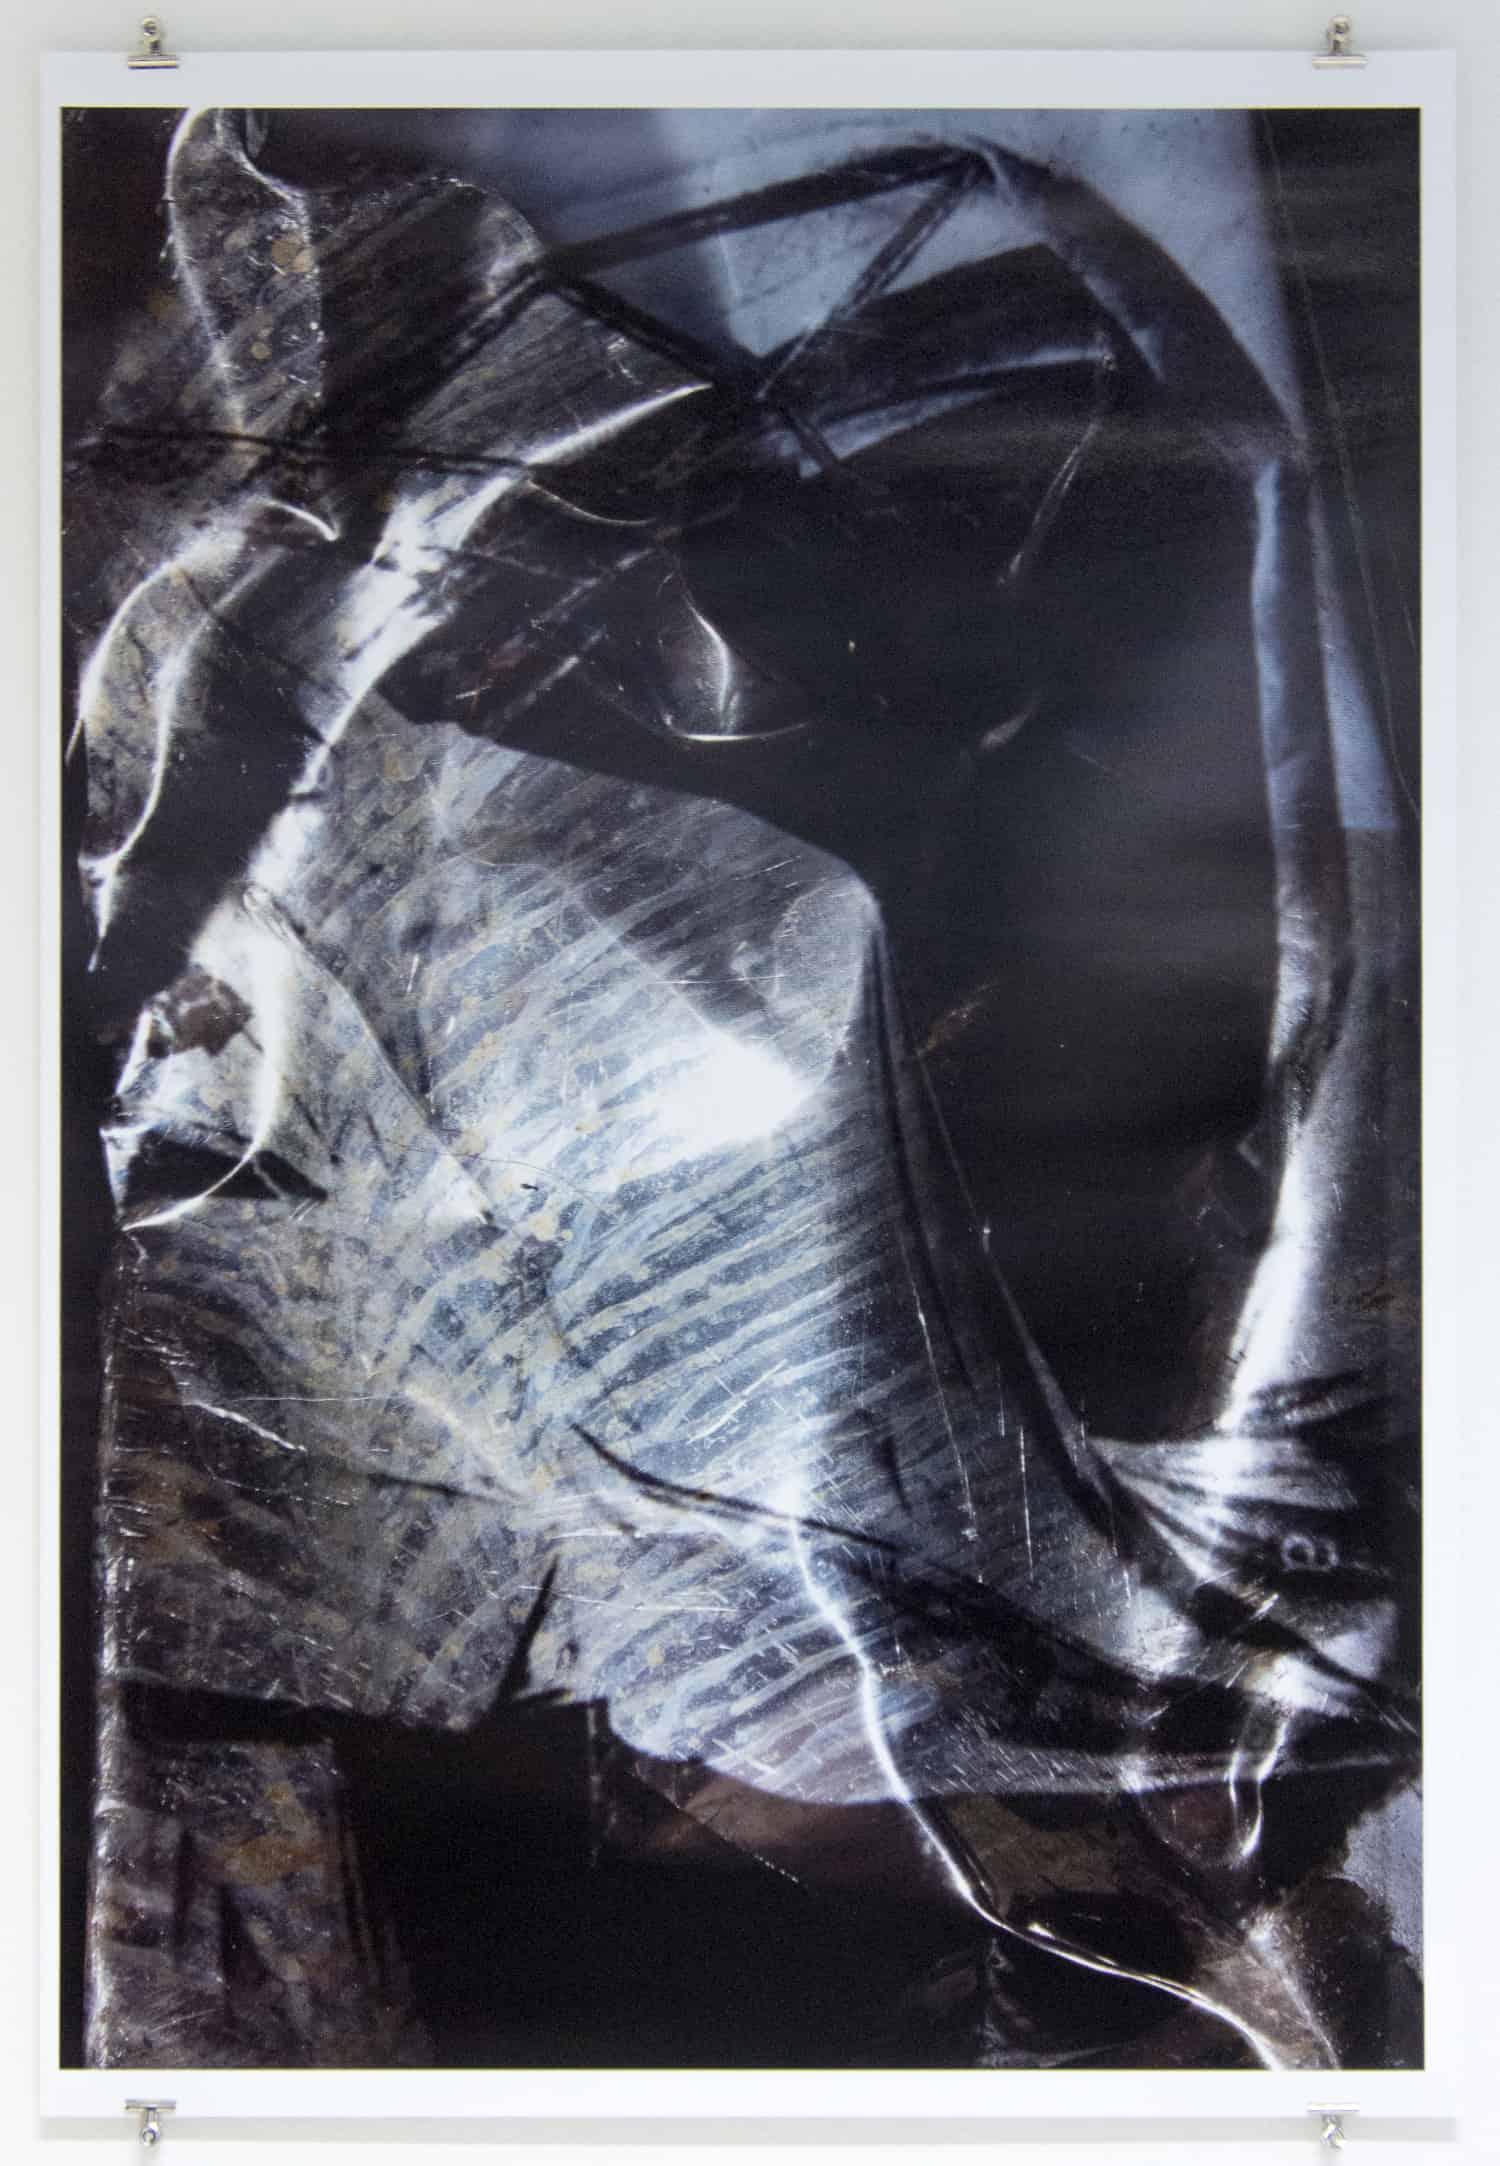 astrid-busch-kunstraum-neudeli-leipzig-2018-2